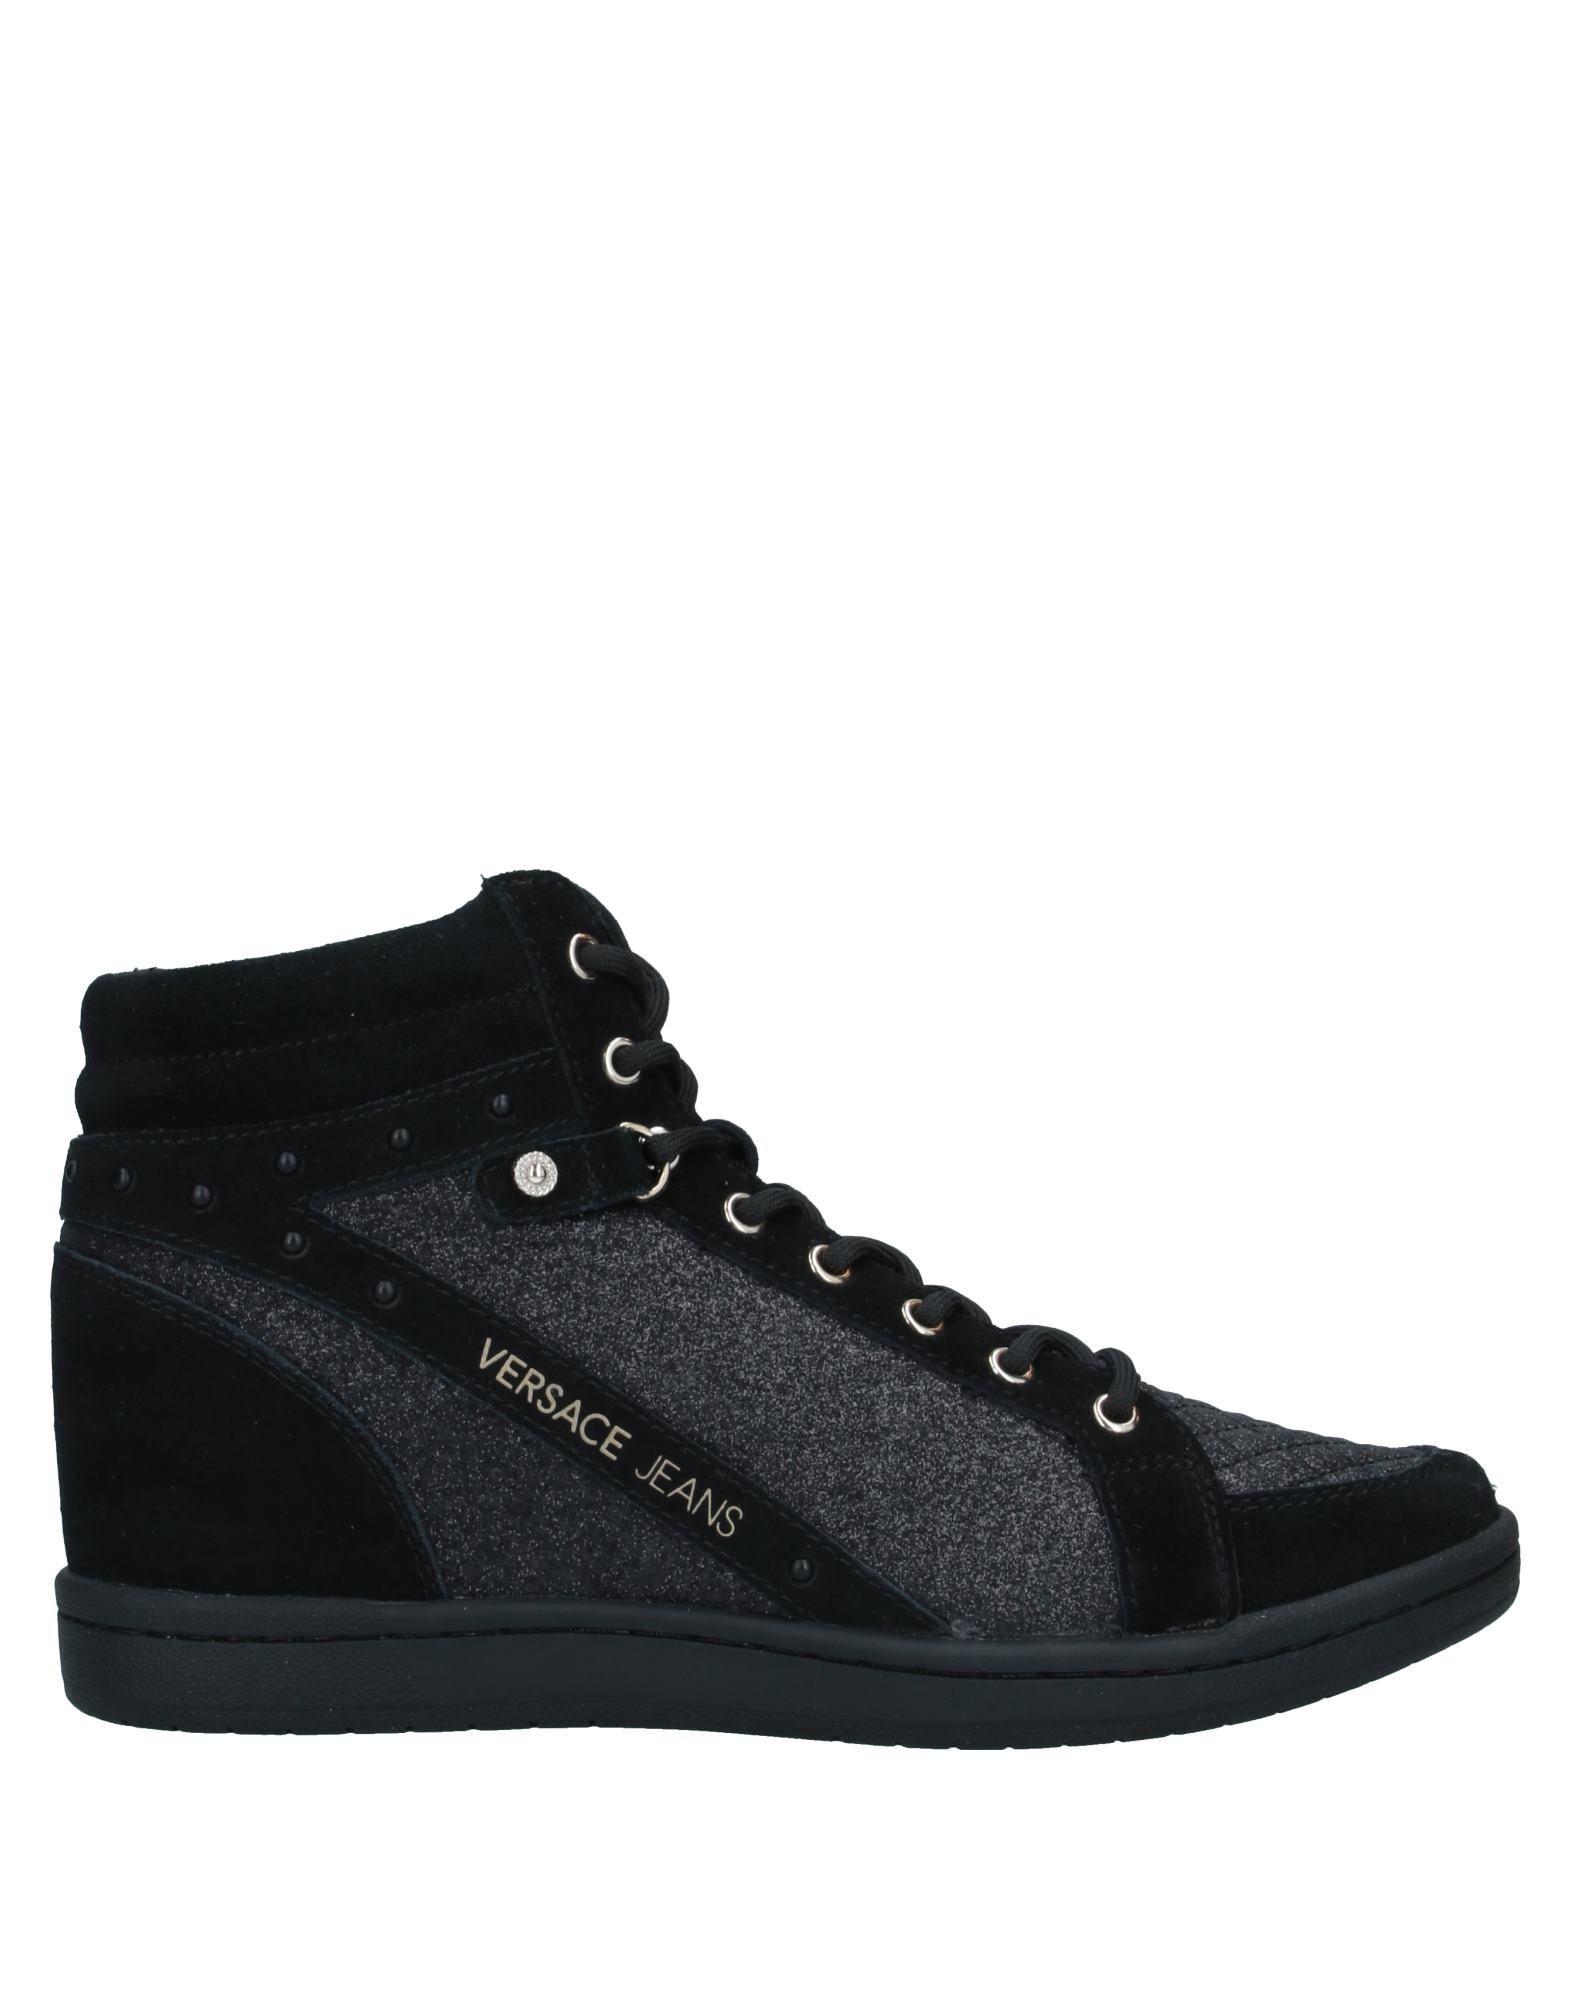 Turnschuhe Versace Jeans damen - 11753739IH